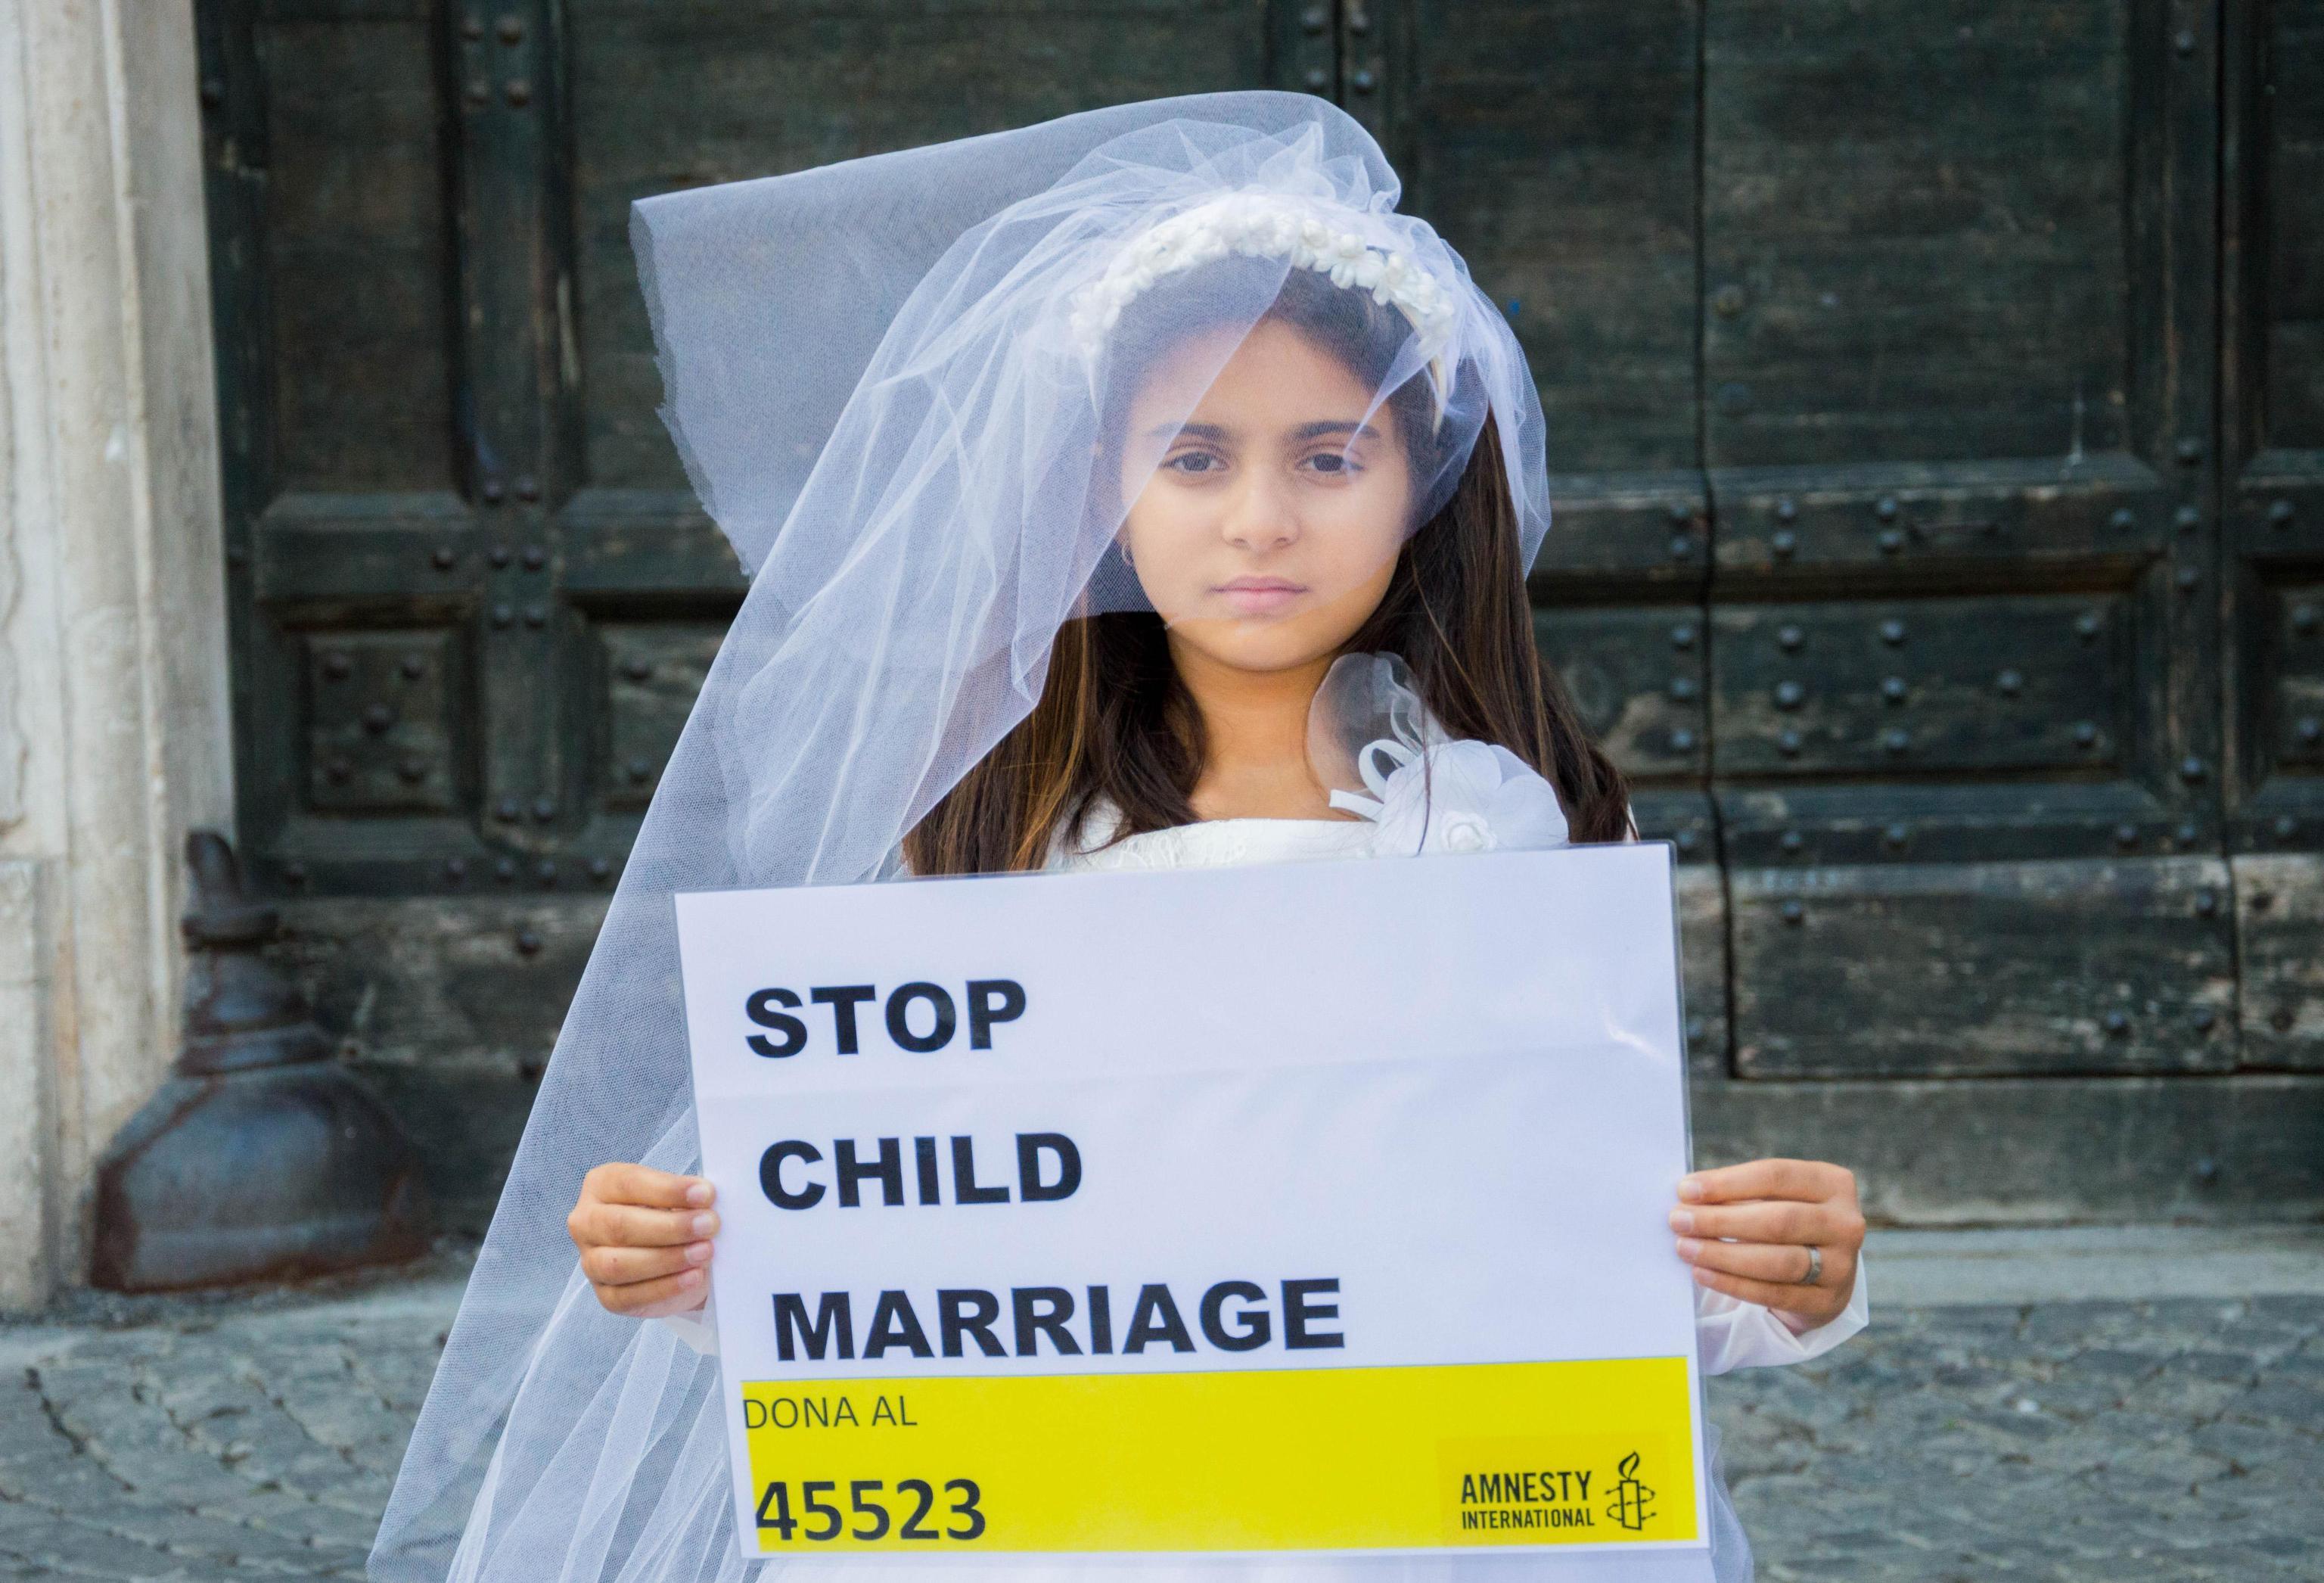 Dorhoty, sposa bambina venduta a 12 anni per 20 euro: 'Ho già 5 figli'